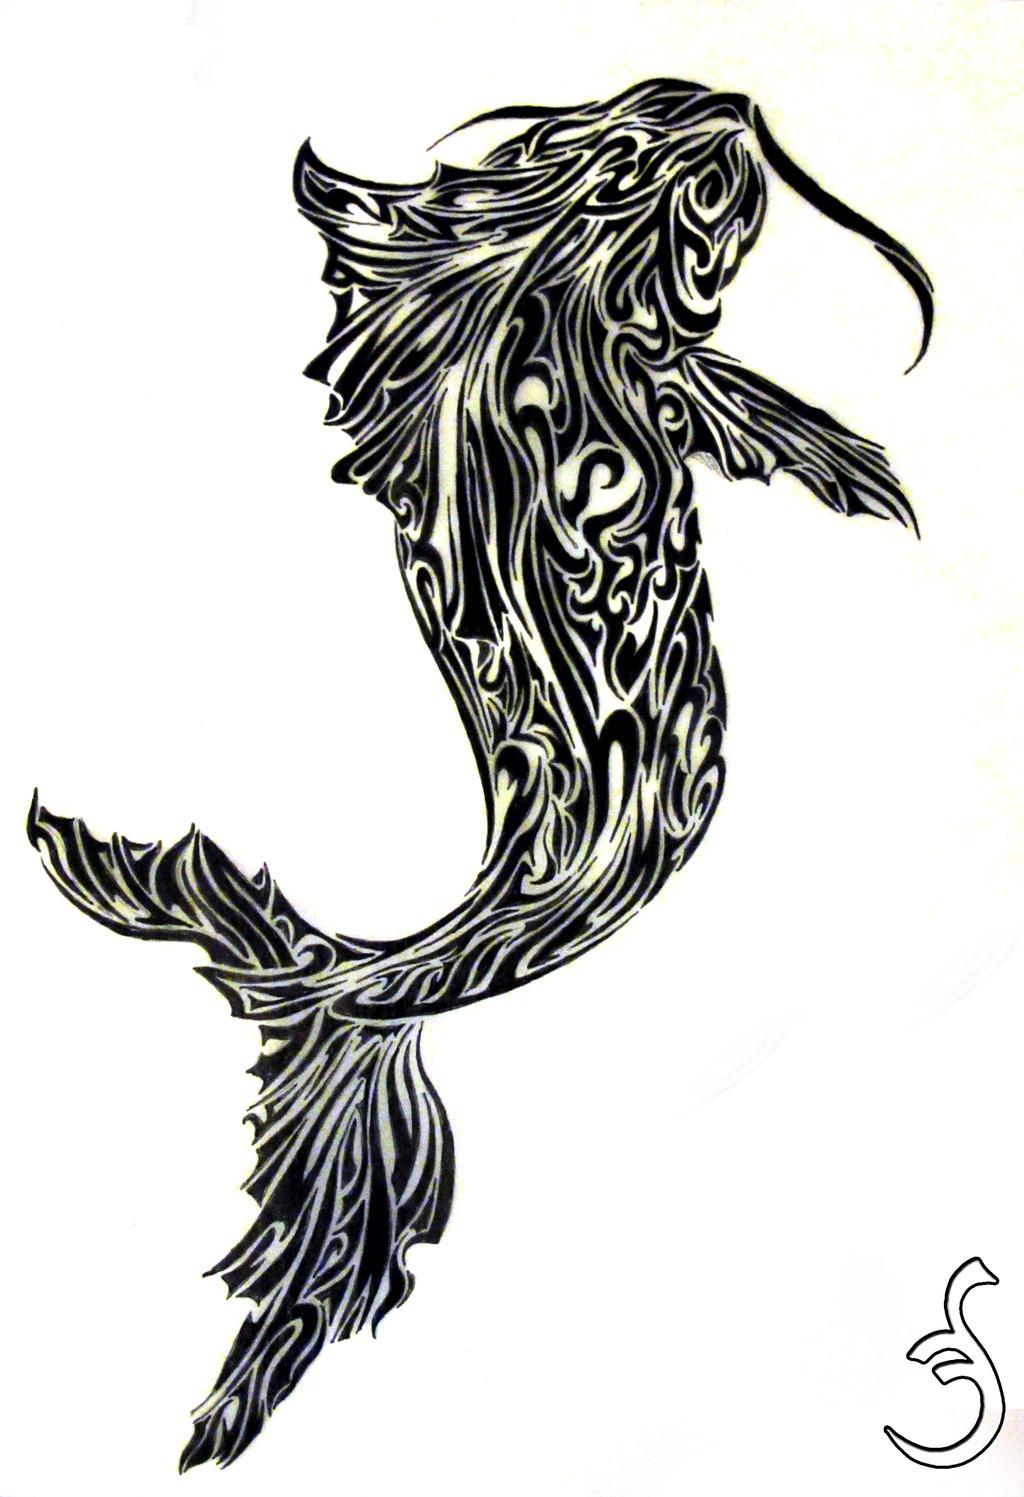 Koi fish tattoo design 2 by griffon2745 on deviantart for Koi fish tattoo designs